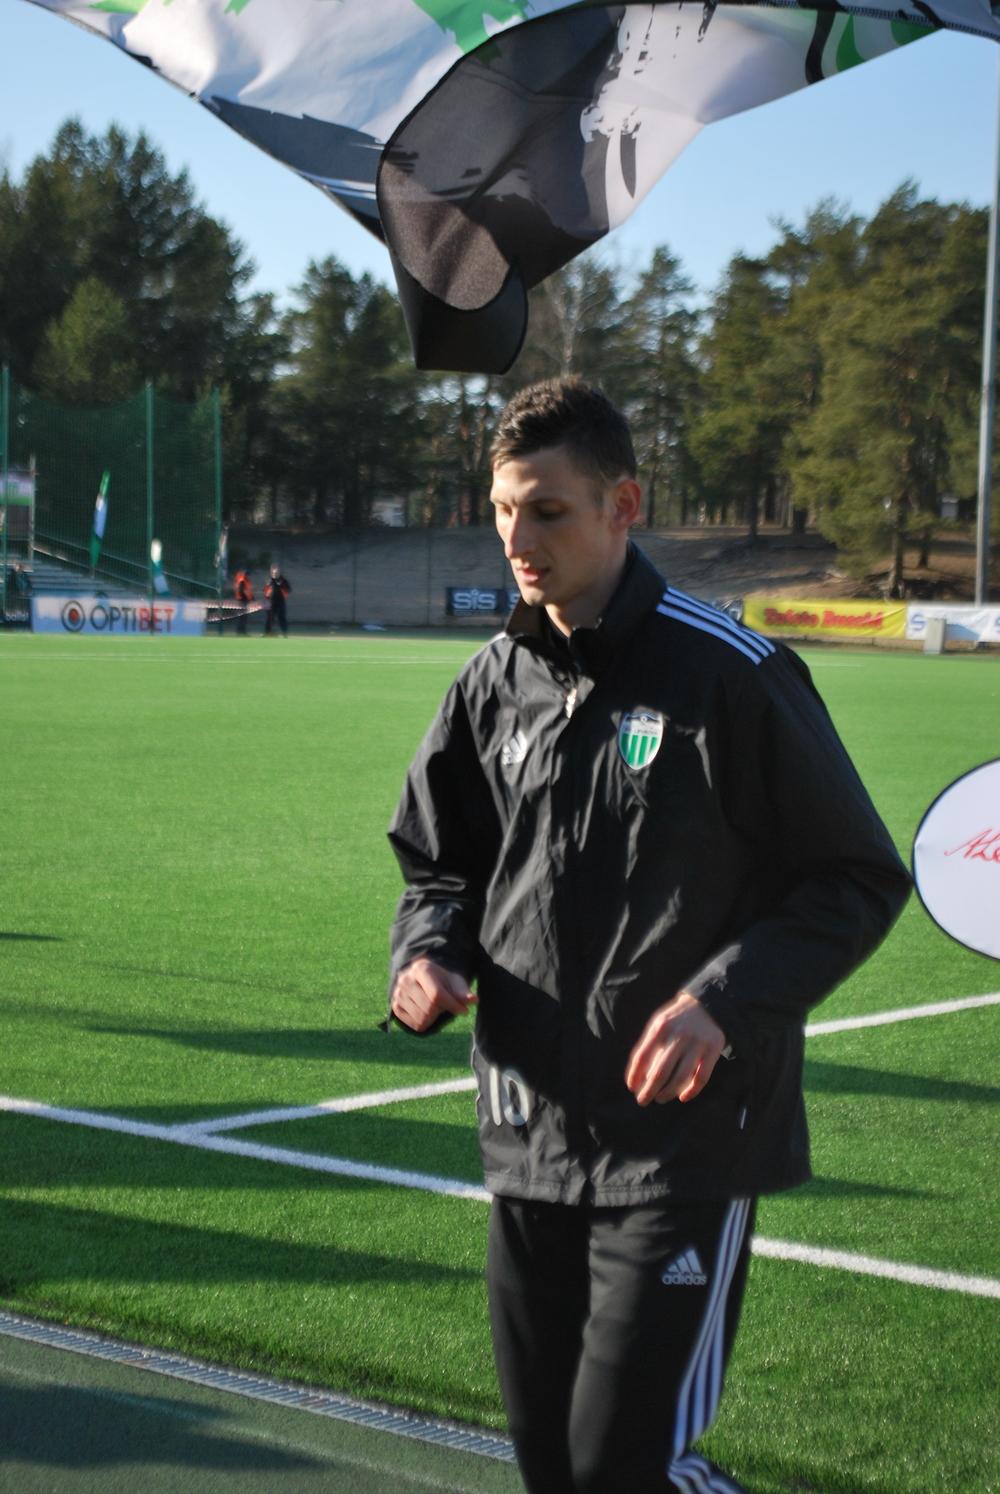 Igor Subbotin, 4 goals this season including the brace against Loko (RdS)